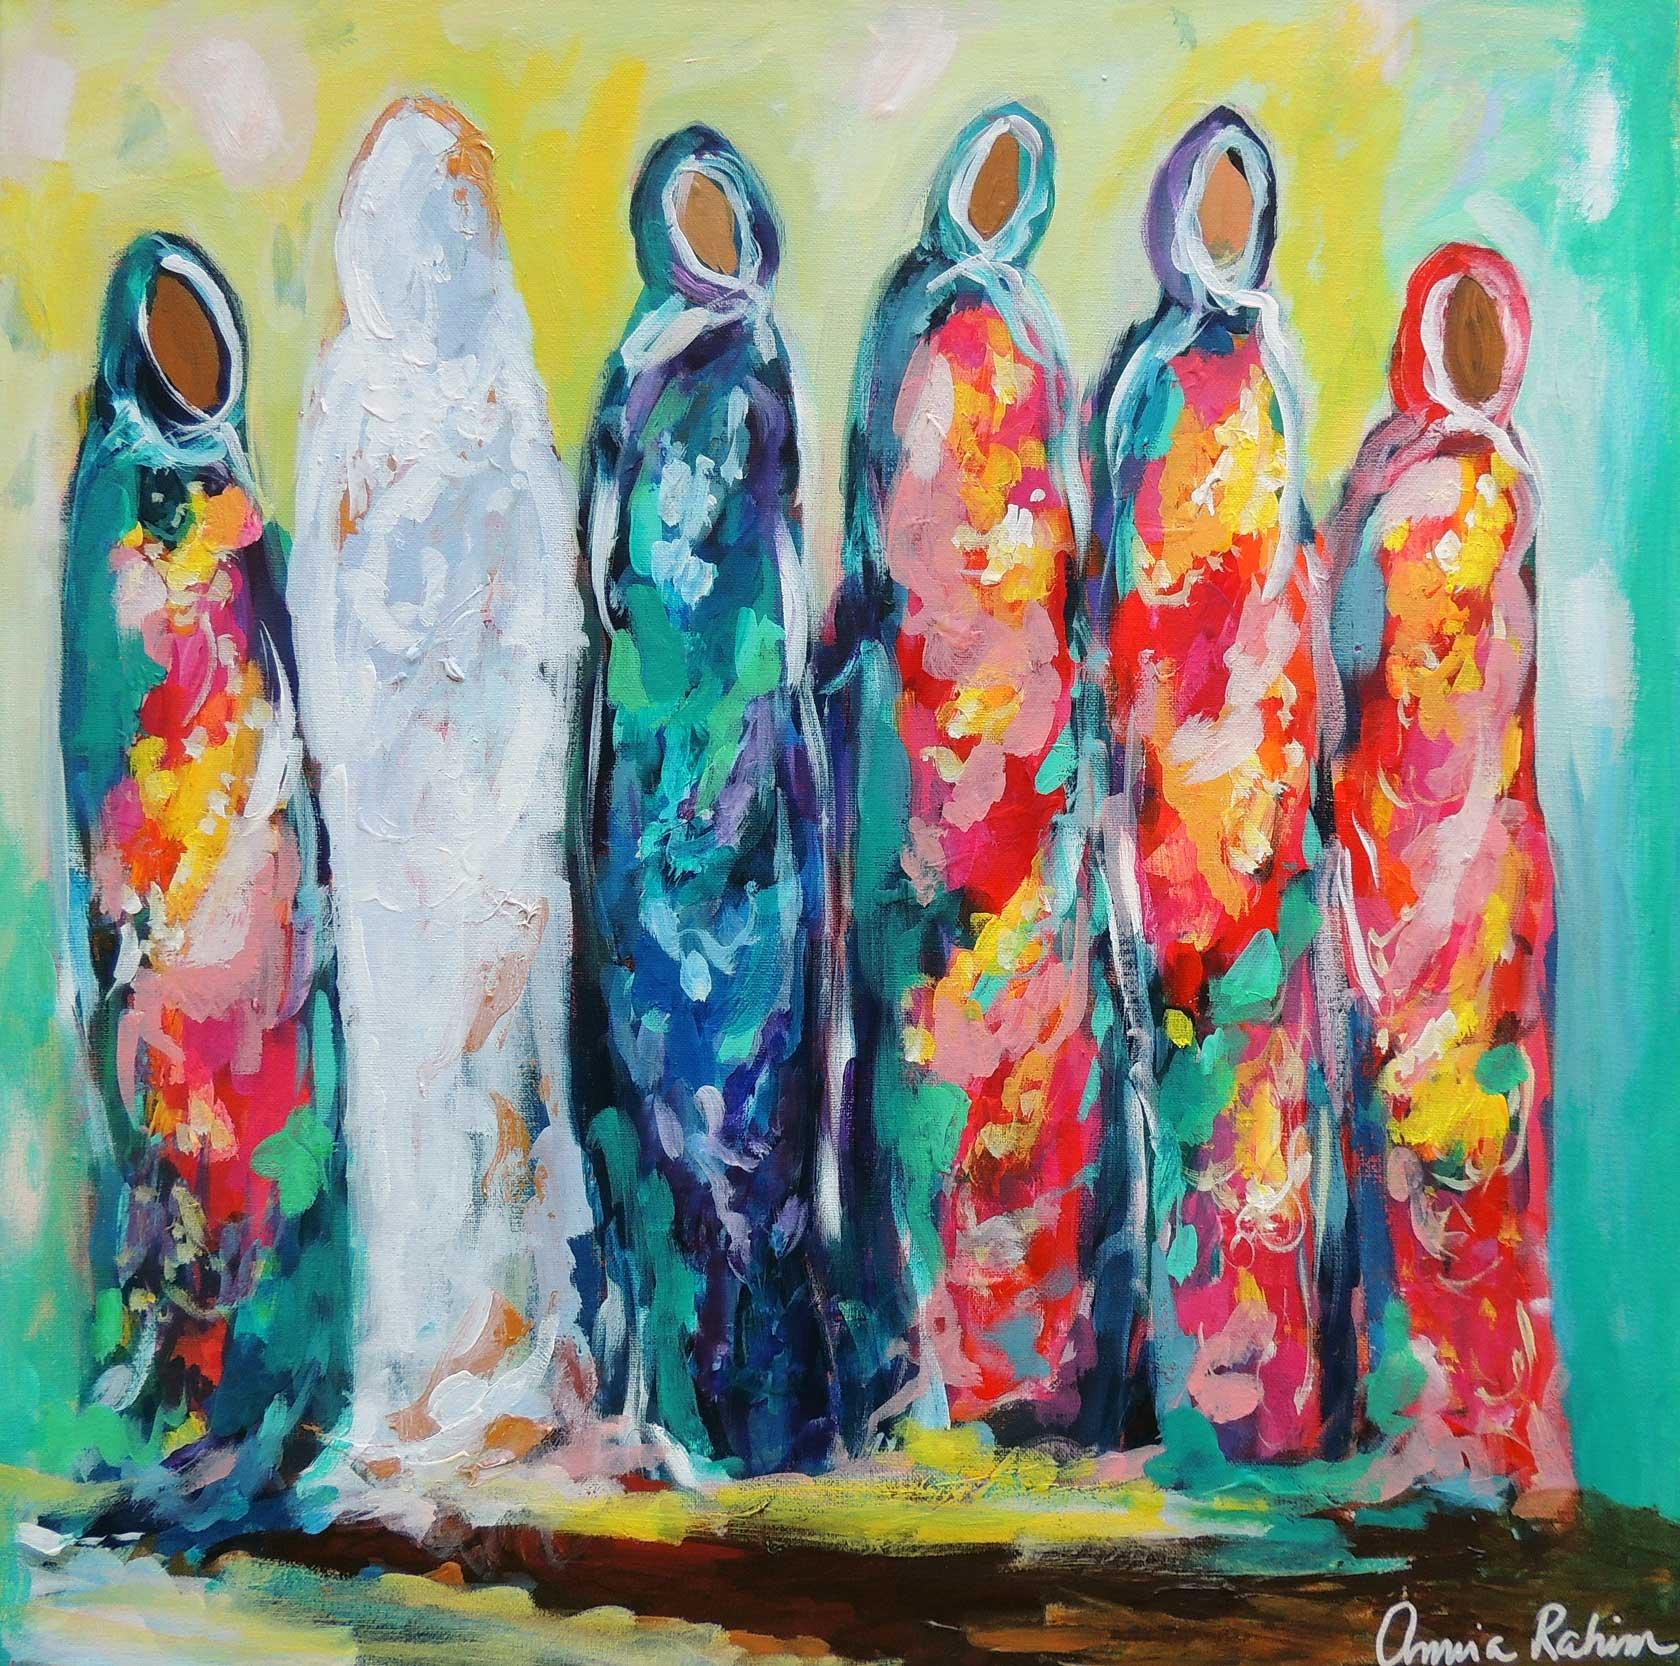 """The Wedding II"" 24x24"" acrylic on canvas, Available"